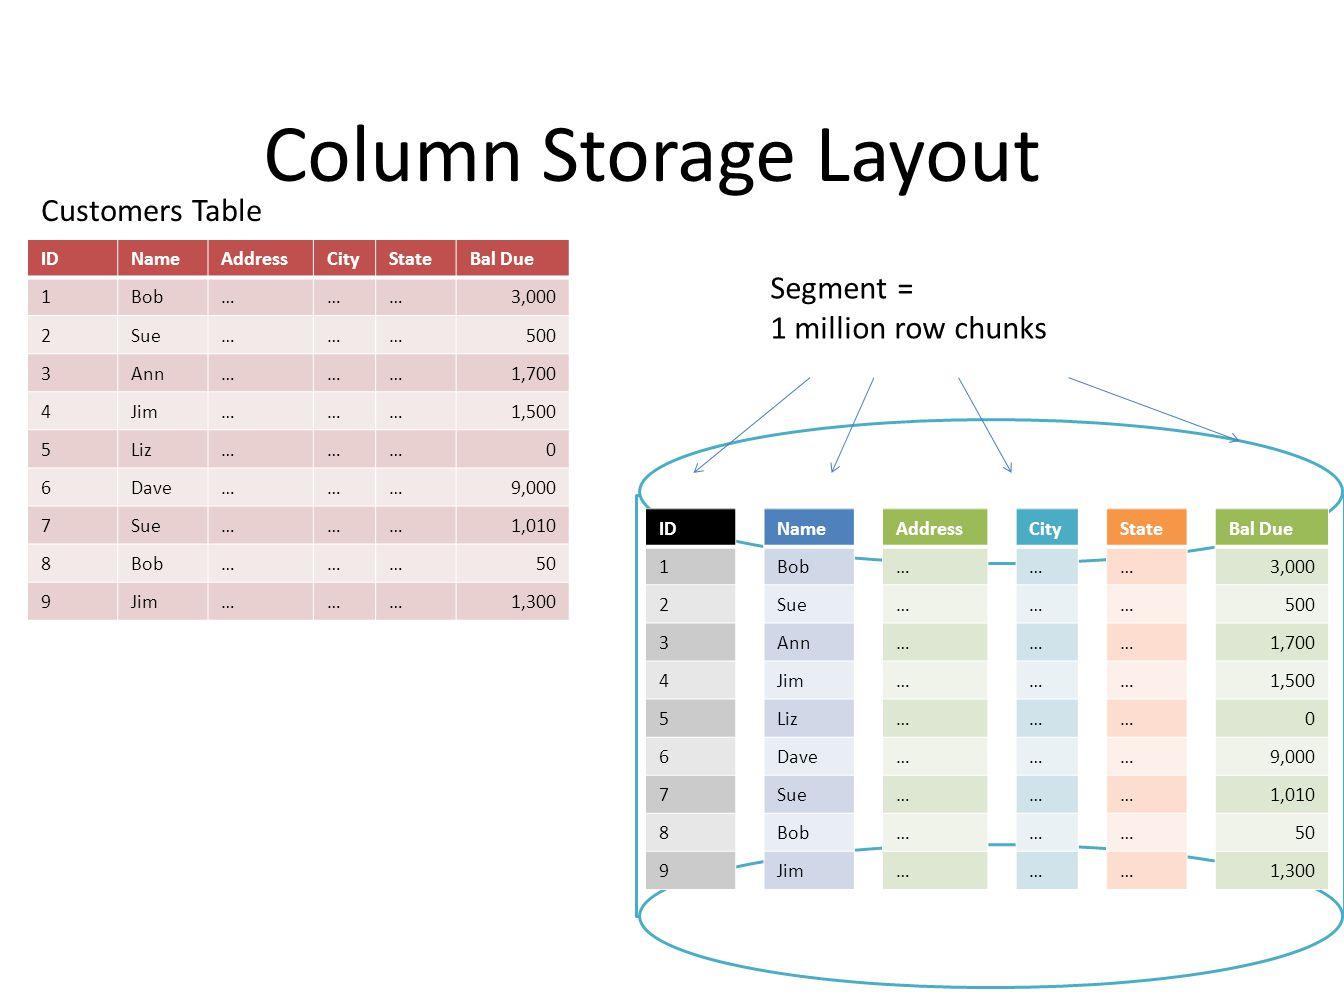 Column Storage Layout IDNameAddressCityStateBal Due 1Bob………3,000 2Sue………500 3Ann………1,700 4Jim………1,500 5Liz………0 6Dave………9,000 7Sue………1,010 8Bob………50 9Jim………1,300 Customers Table ID 1 2 3 4 5 6 7 8 9 Name Bob Sue Ann Jim Liz Dave Sue Bob Jim Address … … … … … … … … … City … … … … … … … … … State … … … … … … … … … Bal Due 3,000 500 1,700 1,500 0 9,000 1,010 50 1,300 Segment = 1 million row chunks